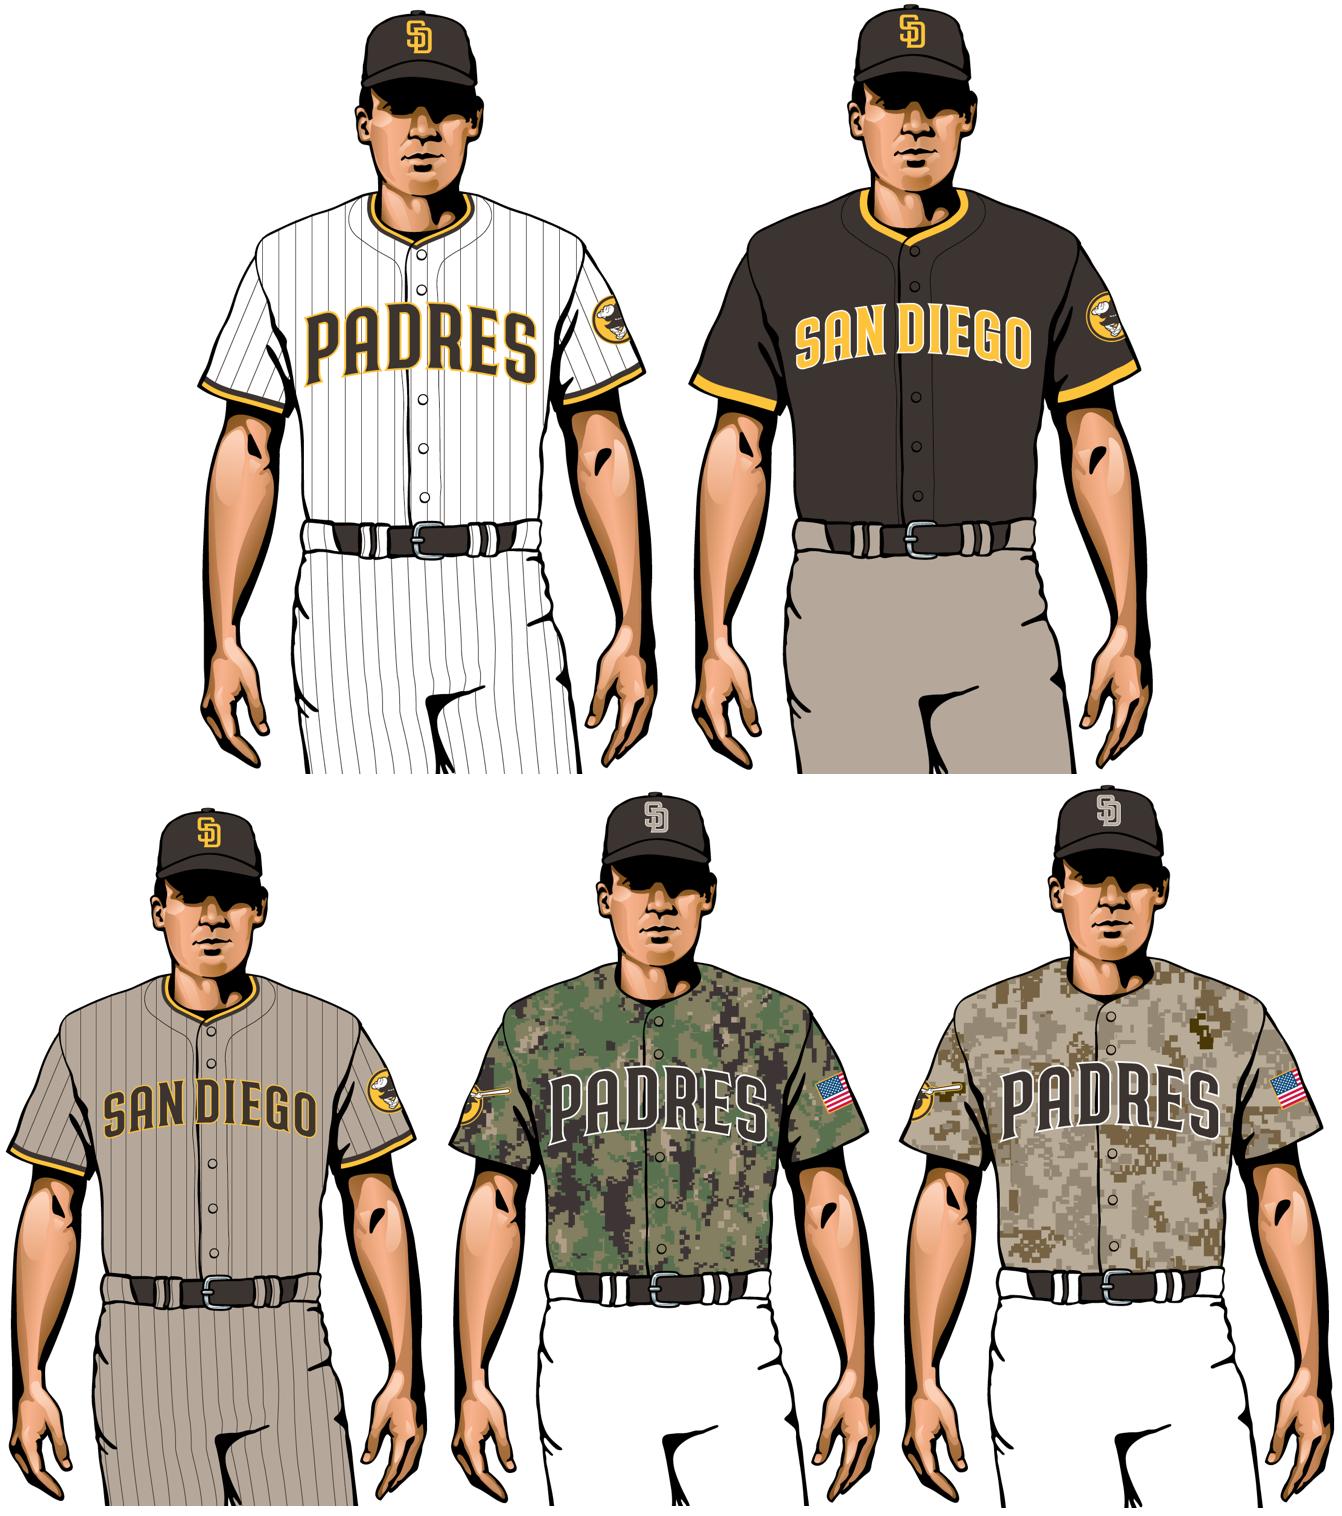 san diego padres 2020 uniforms